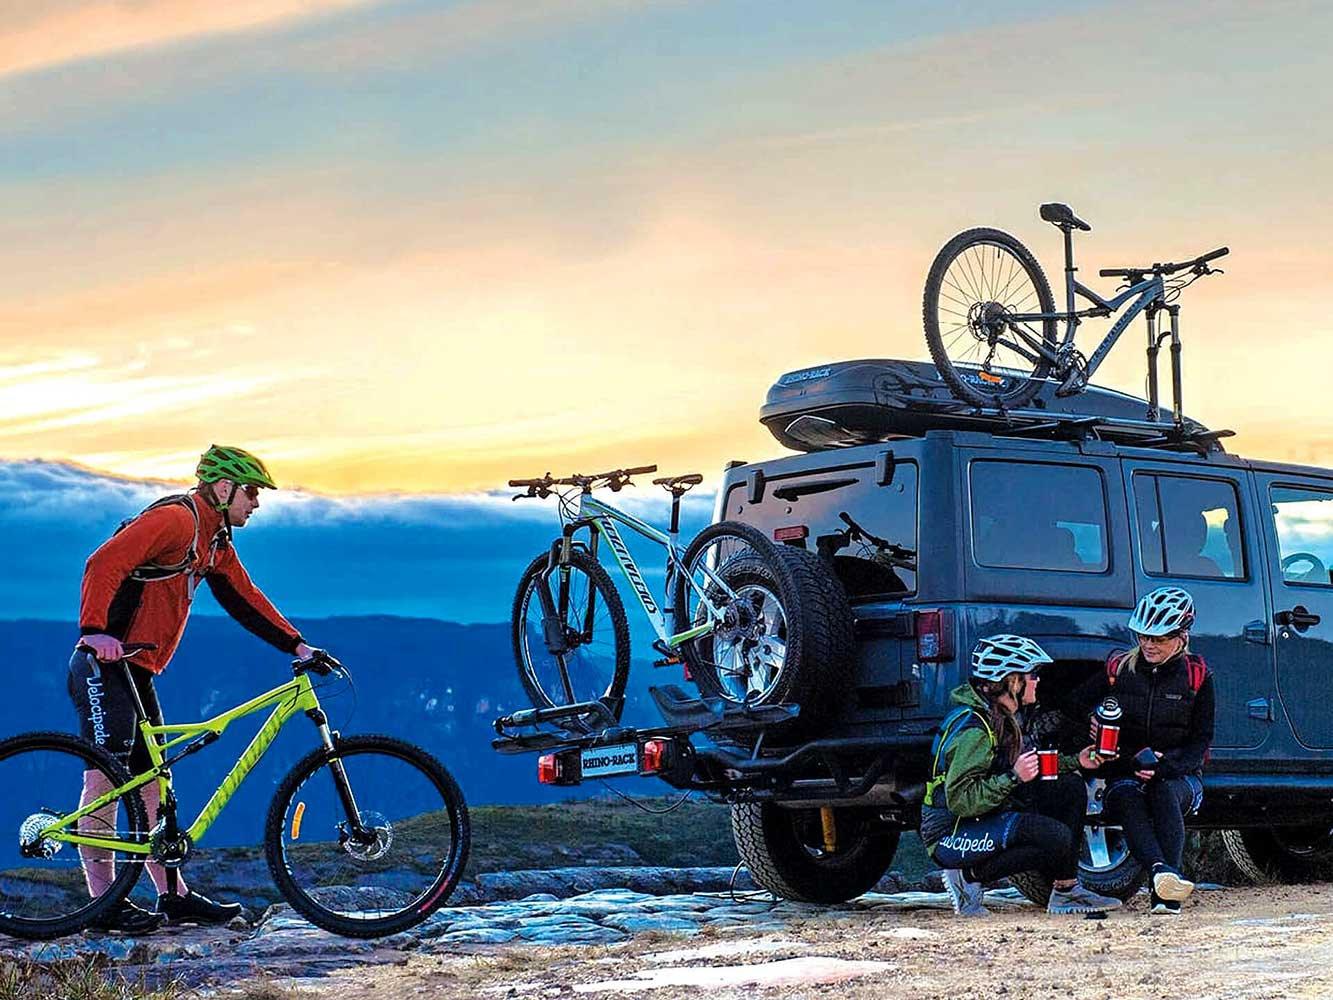 transportar enviar bicicletas-fácil barato soporte coche